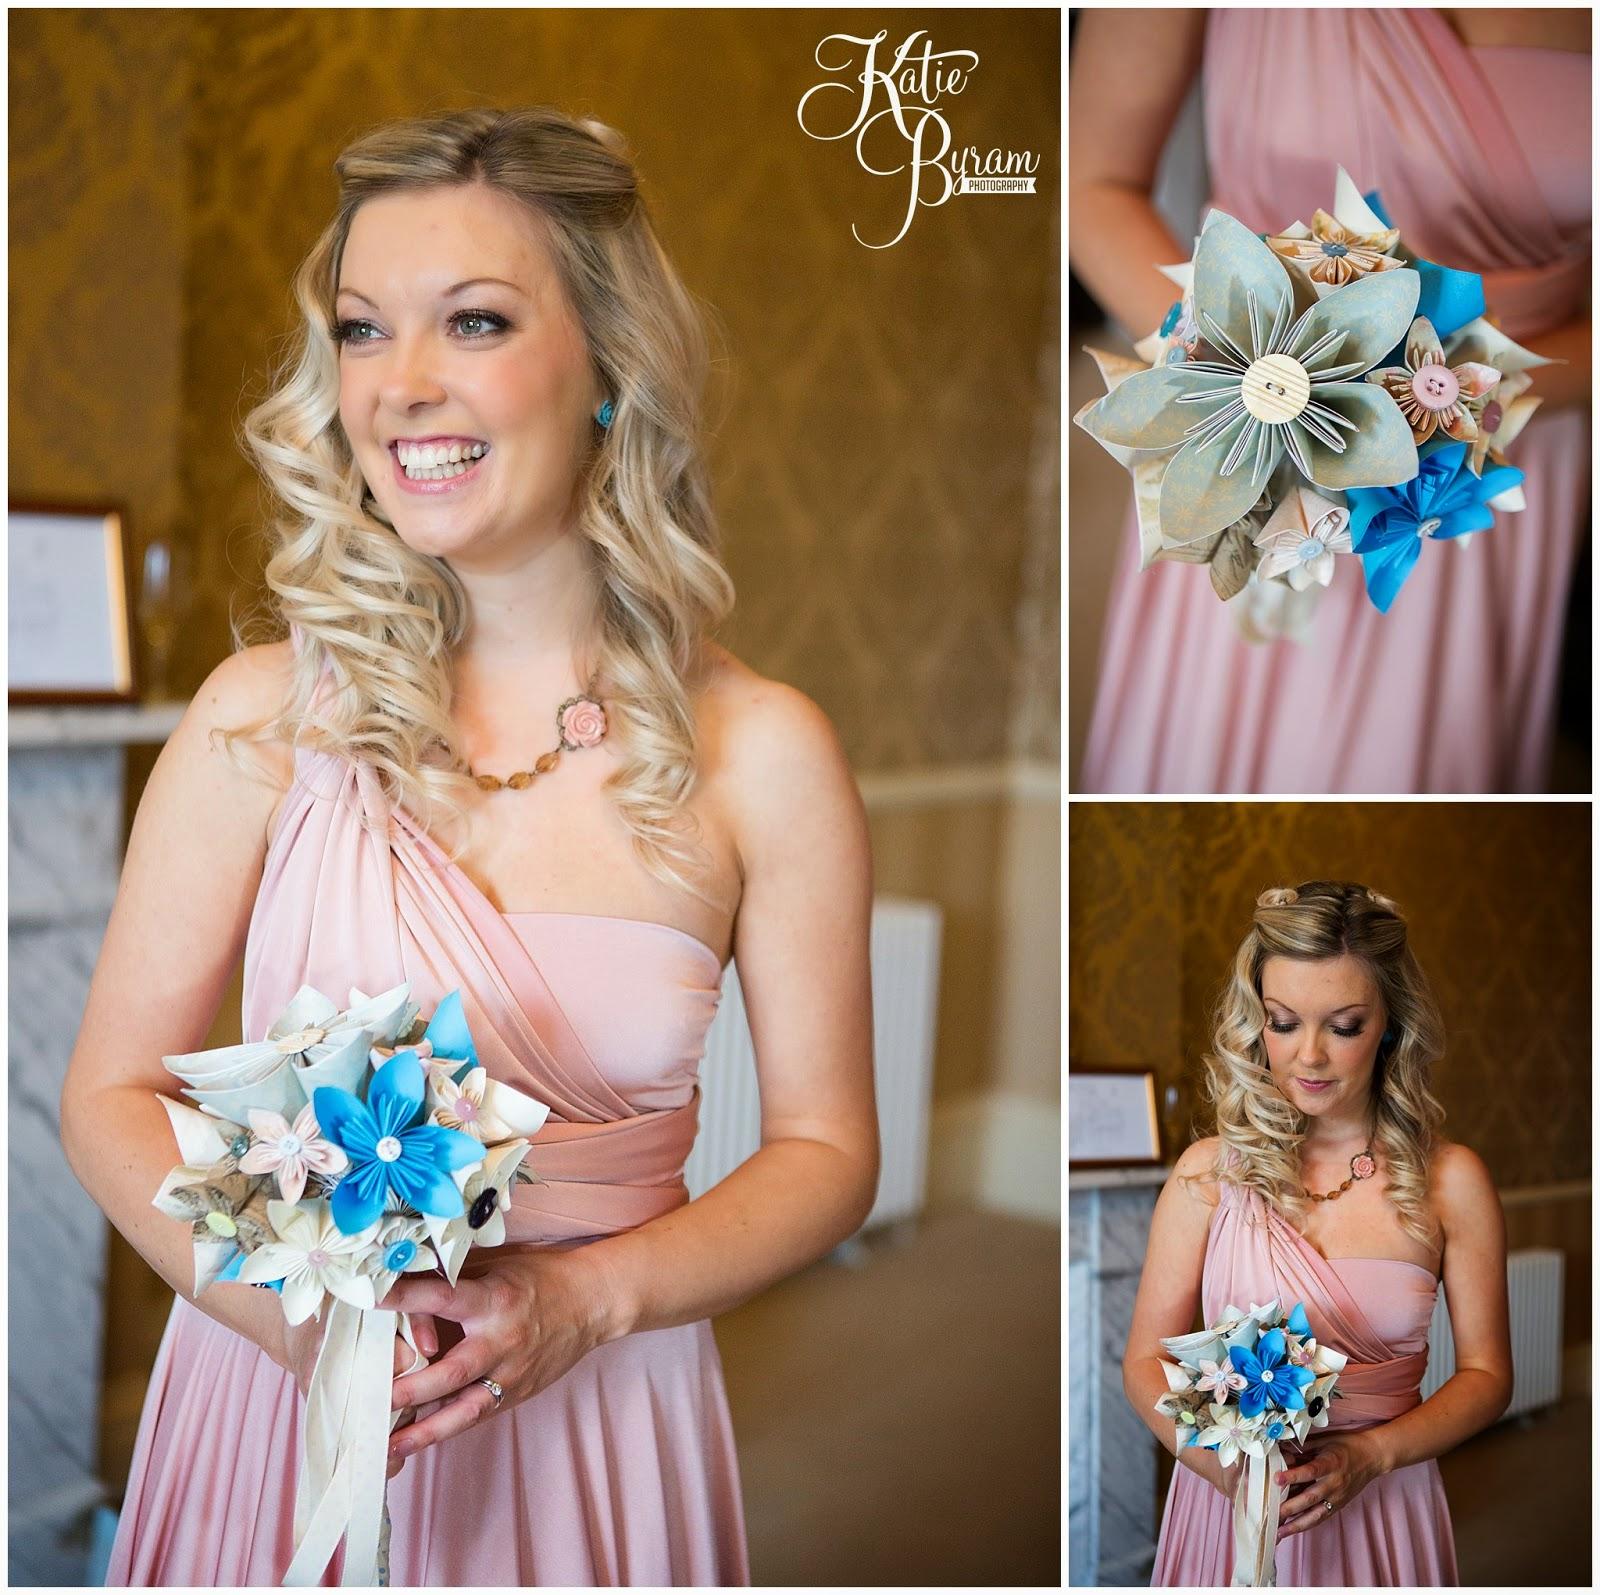 twobirds bridesmaid dress, two birds dress, twobirds wrap dress, bridesmaid dresses